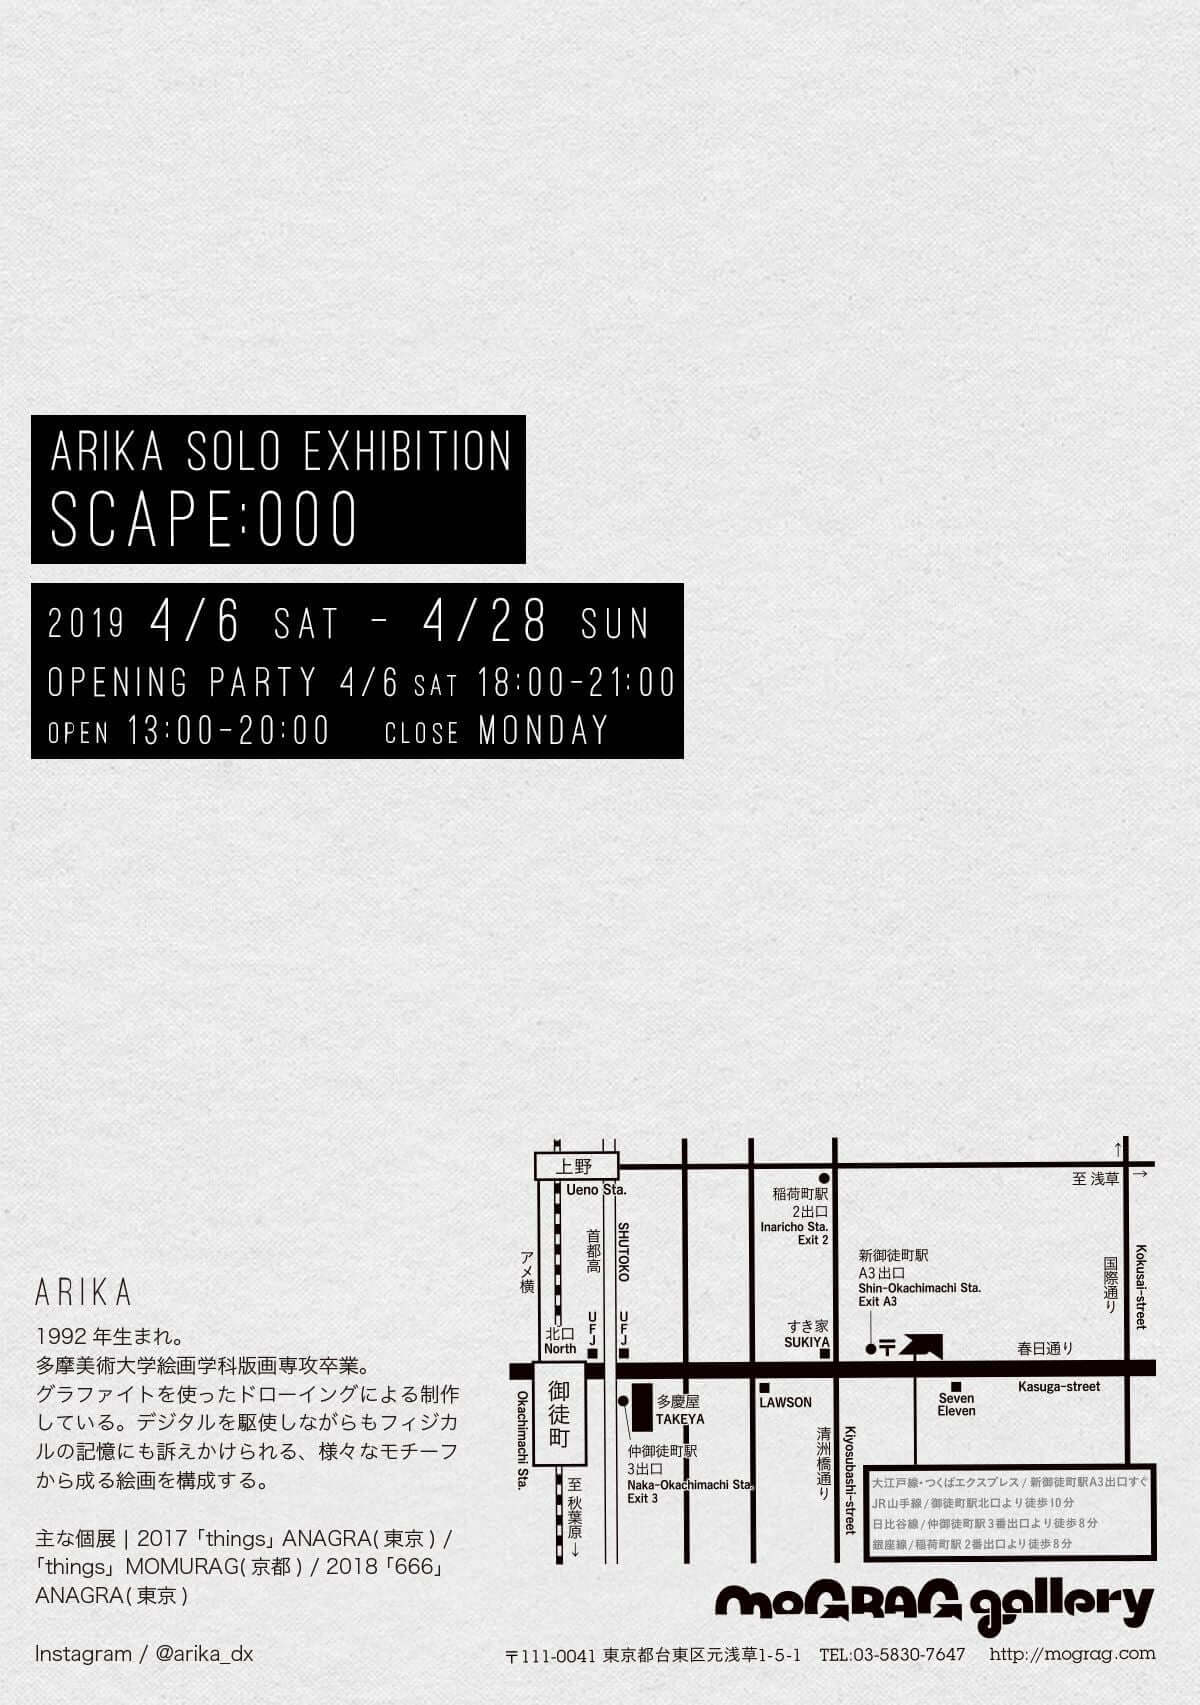 ARIKAの個展「scape:000」がmograg galleryにて4月28日まで開催。今回の展示での新たな試みとは? art-culture190422-arika-1-1200x1705